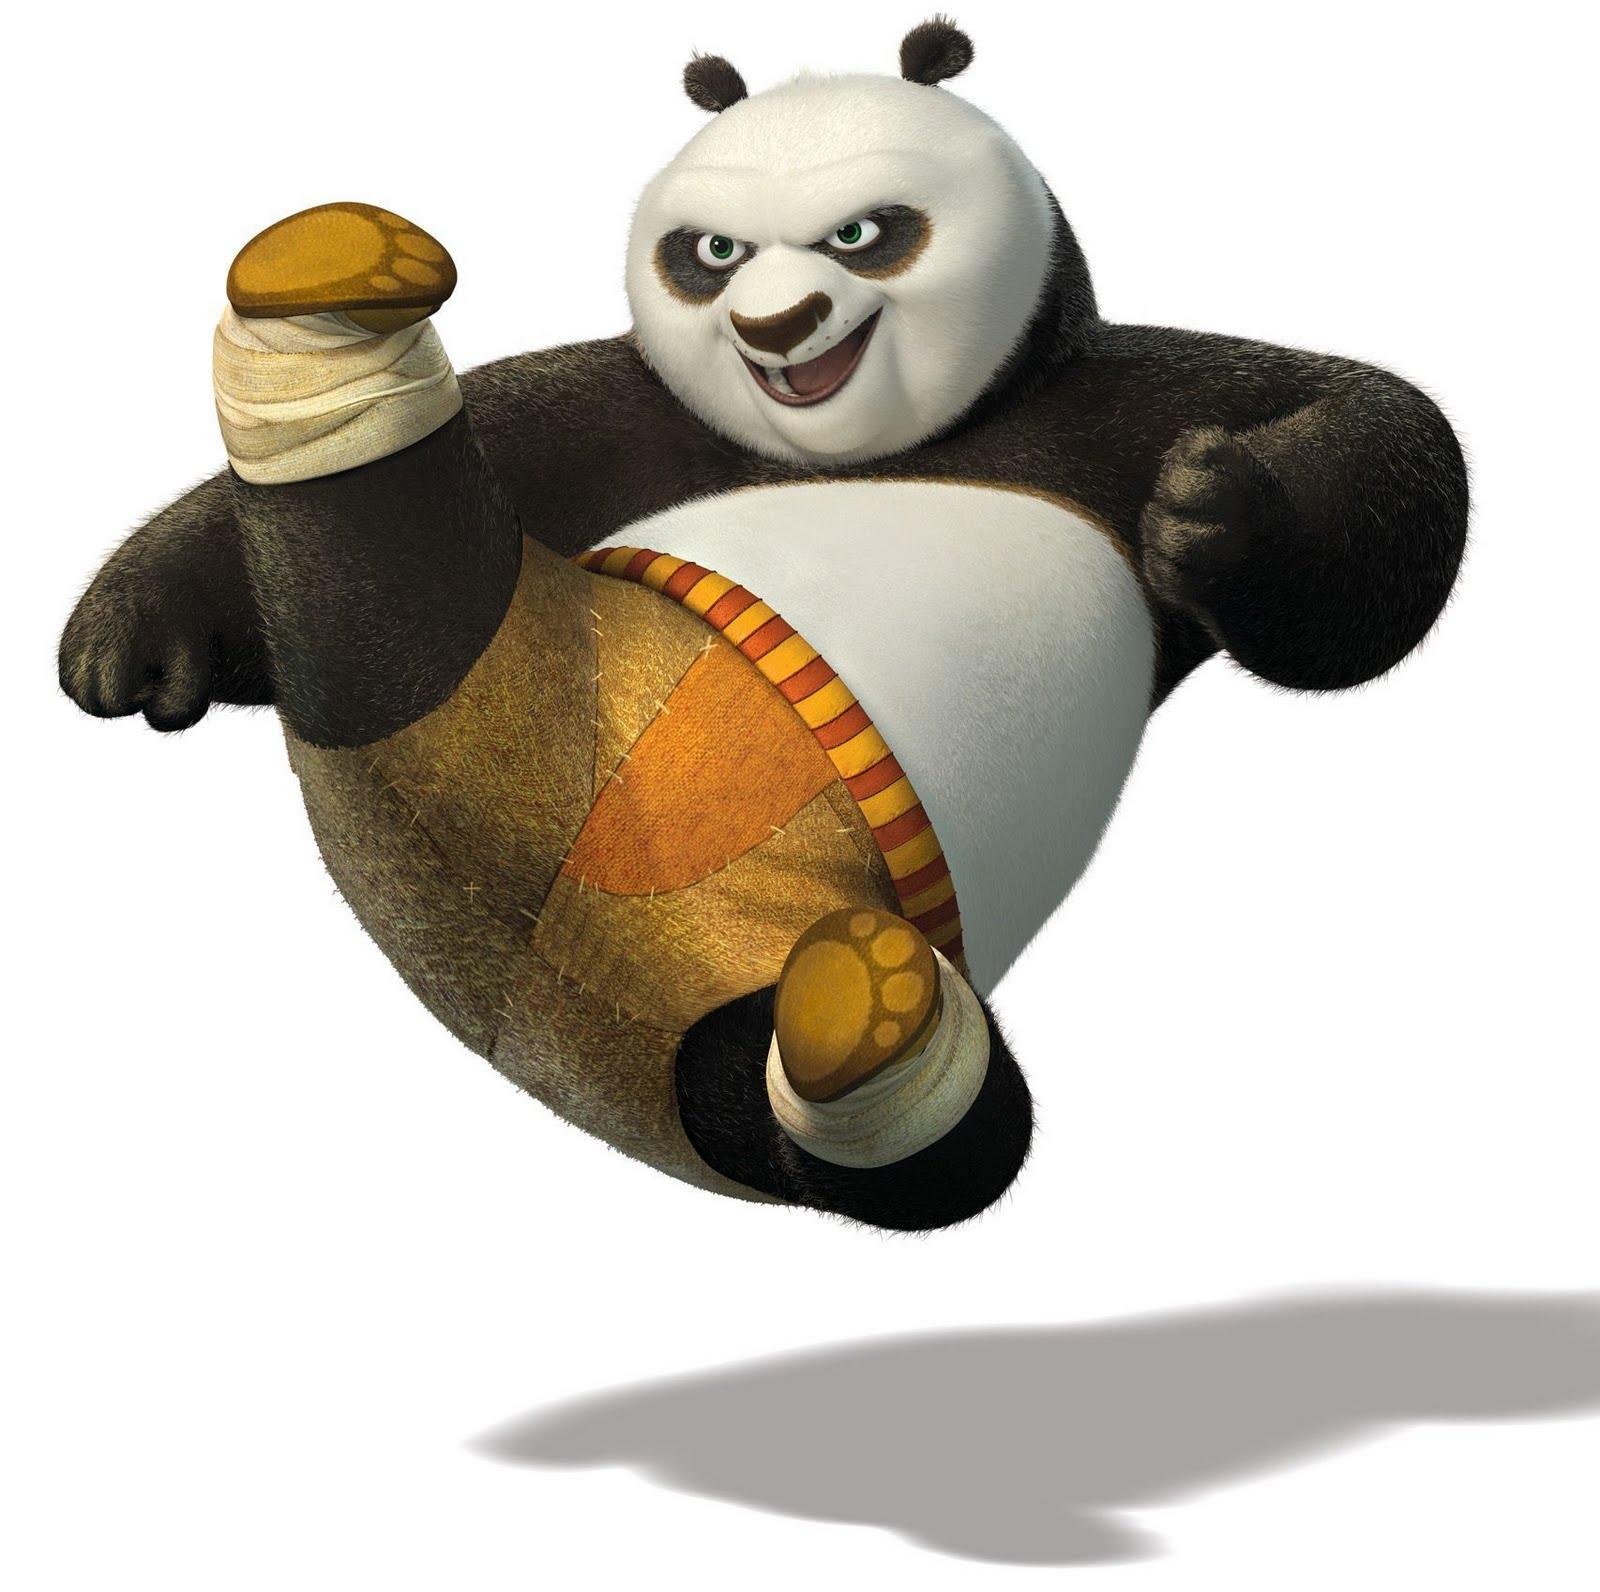 Kung Fu Panda 2 Wallpapers - HQ Wallpaper Collections ...